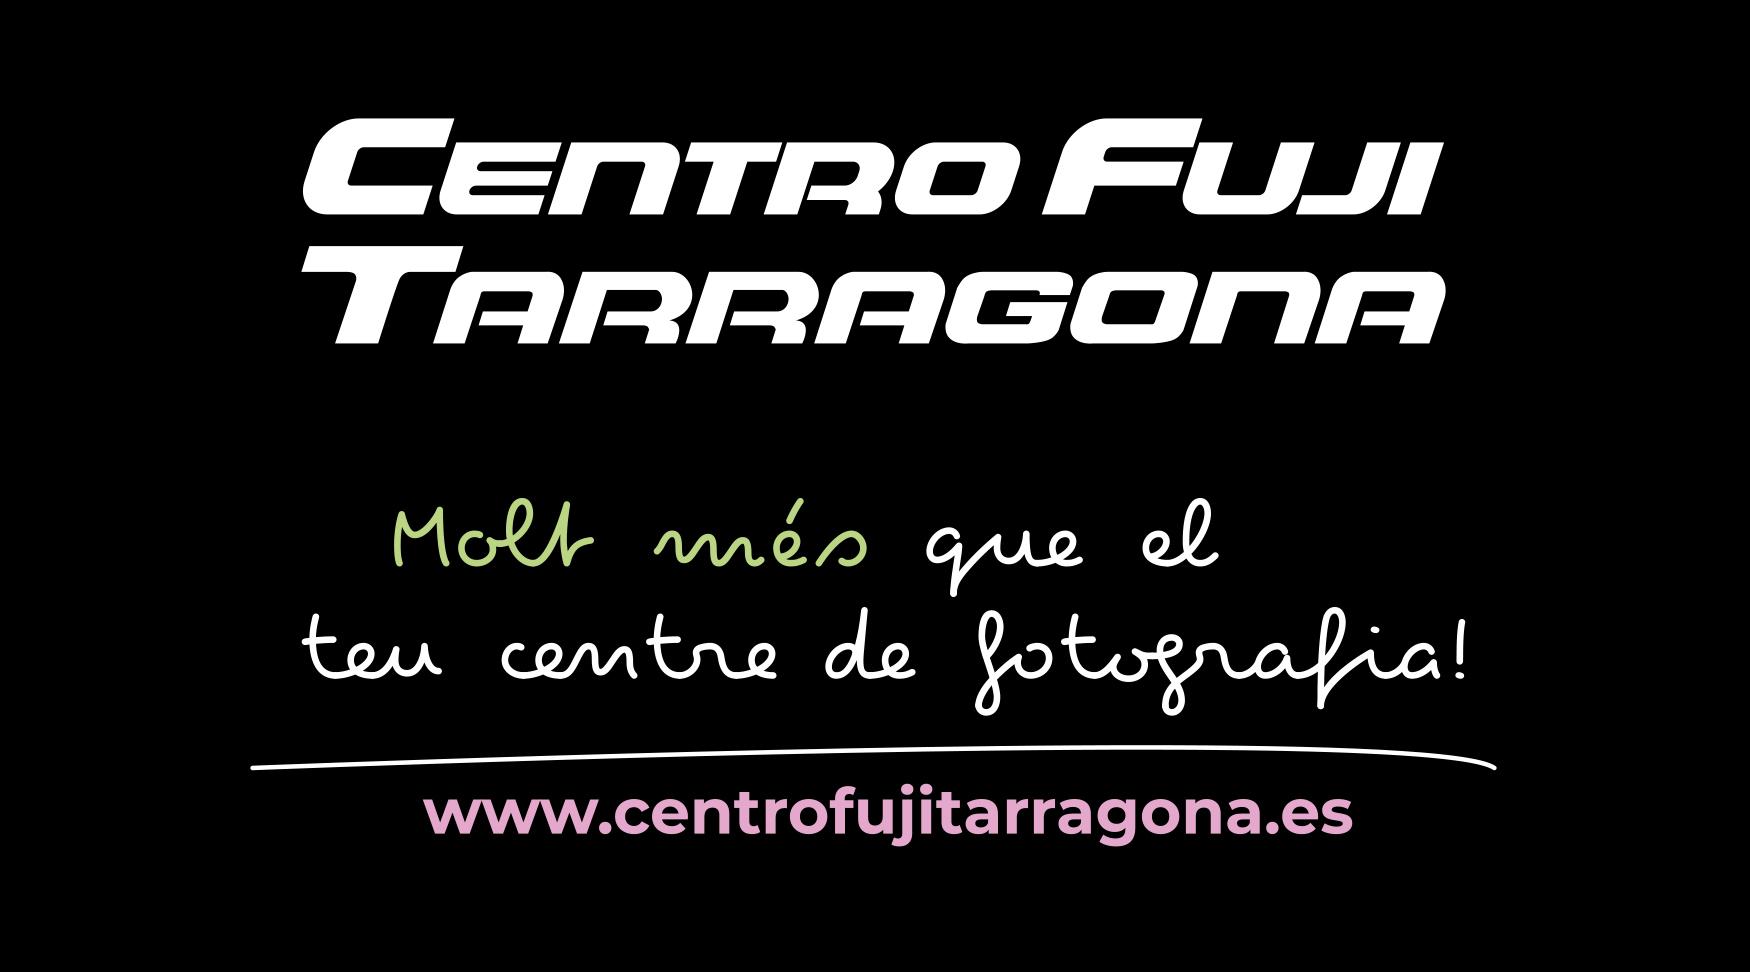 CENTRO FUJI TARRAGONA